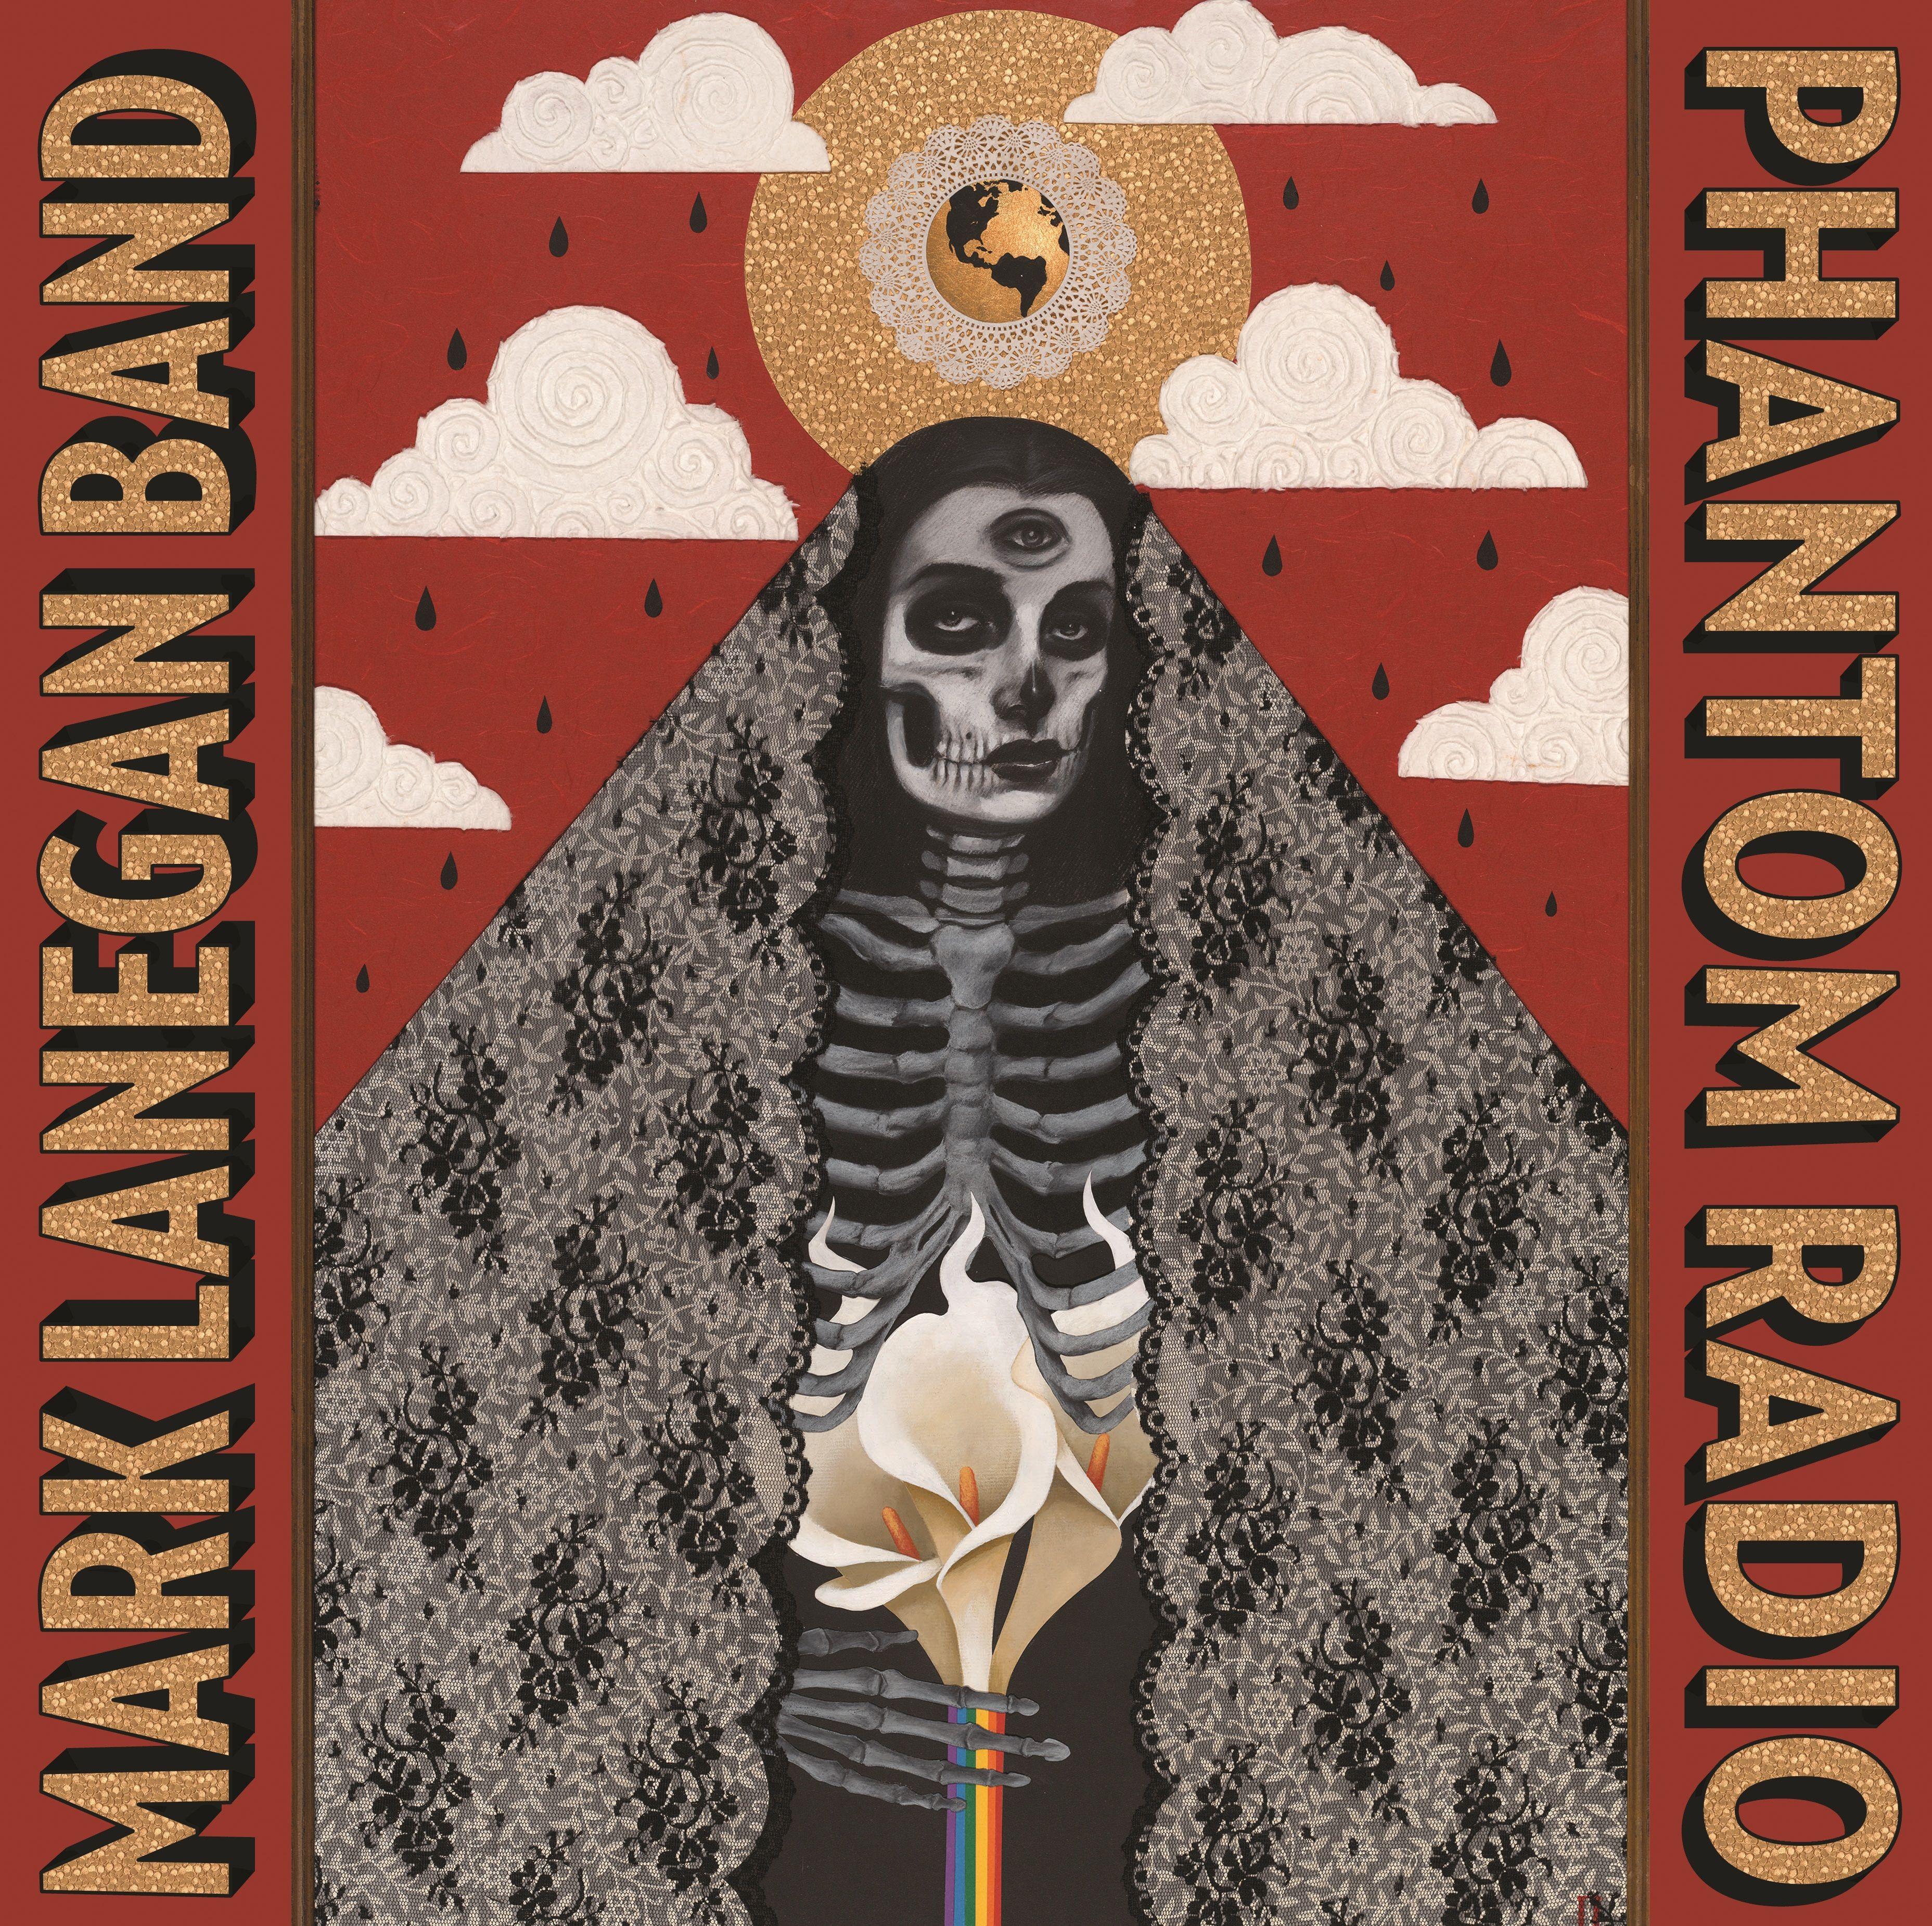 Mark-Lanegan-Band-Phantom-Radio (4)